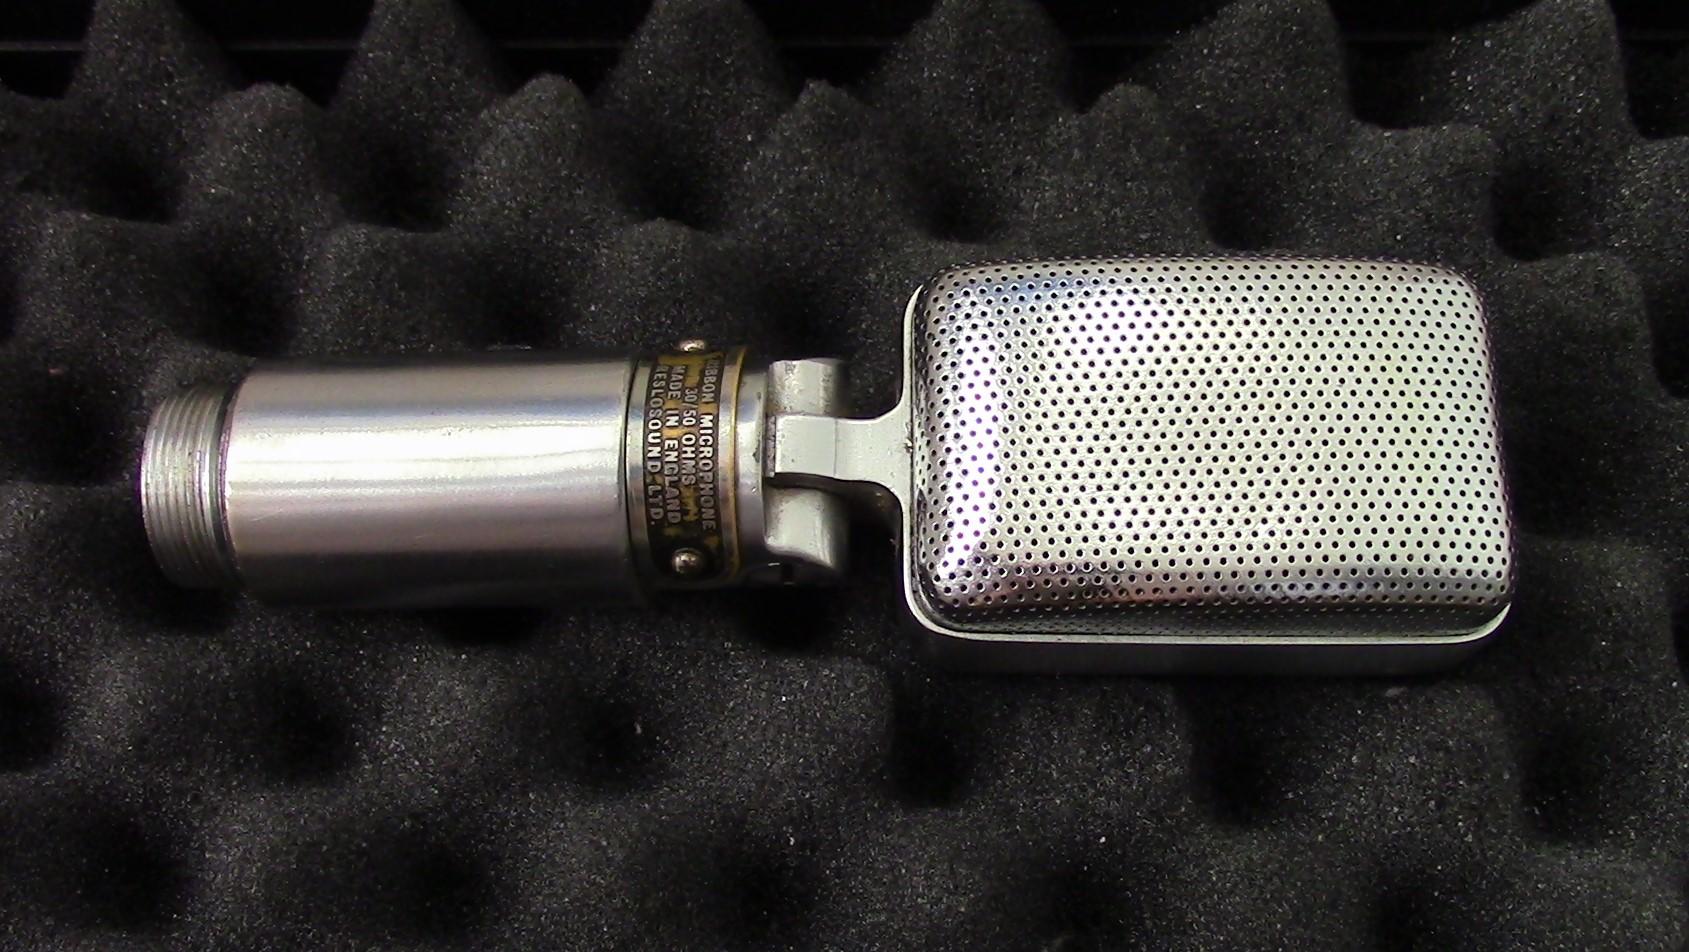 Vintage PA Microphone | Martin Mitc's Microphones on